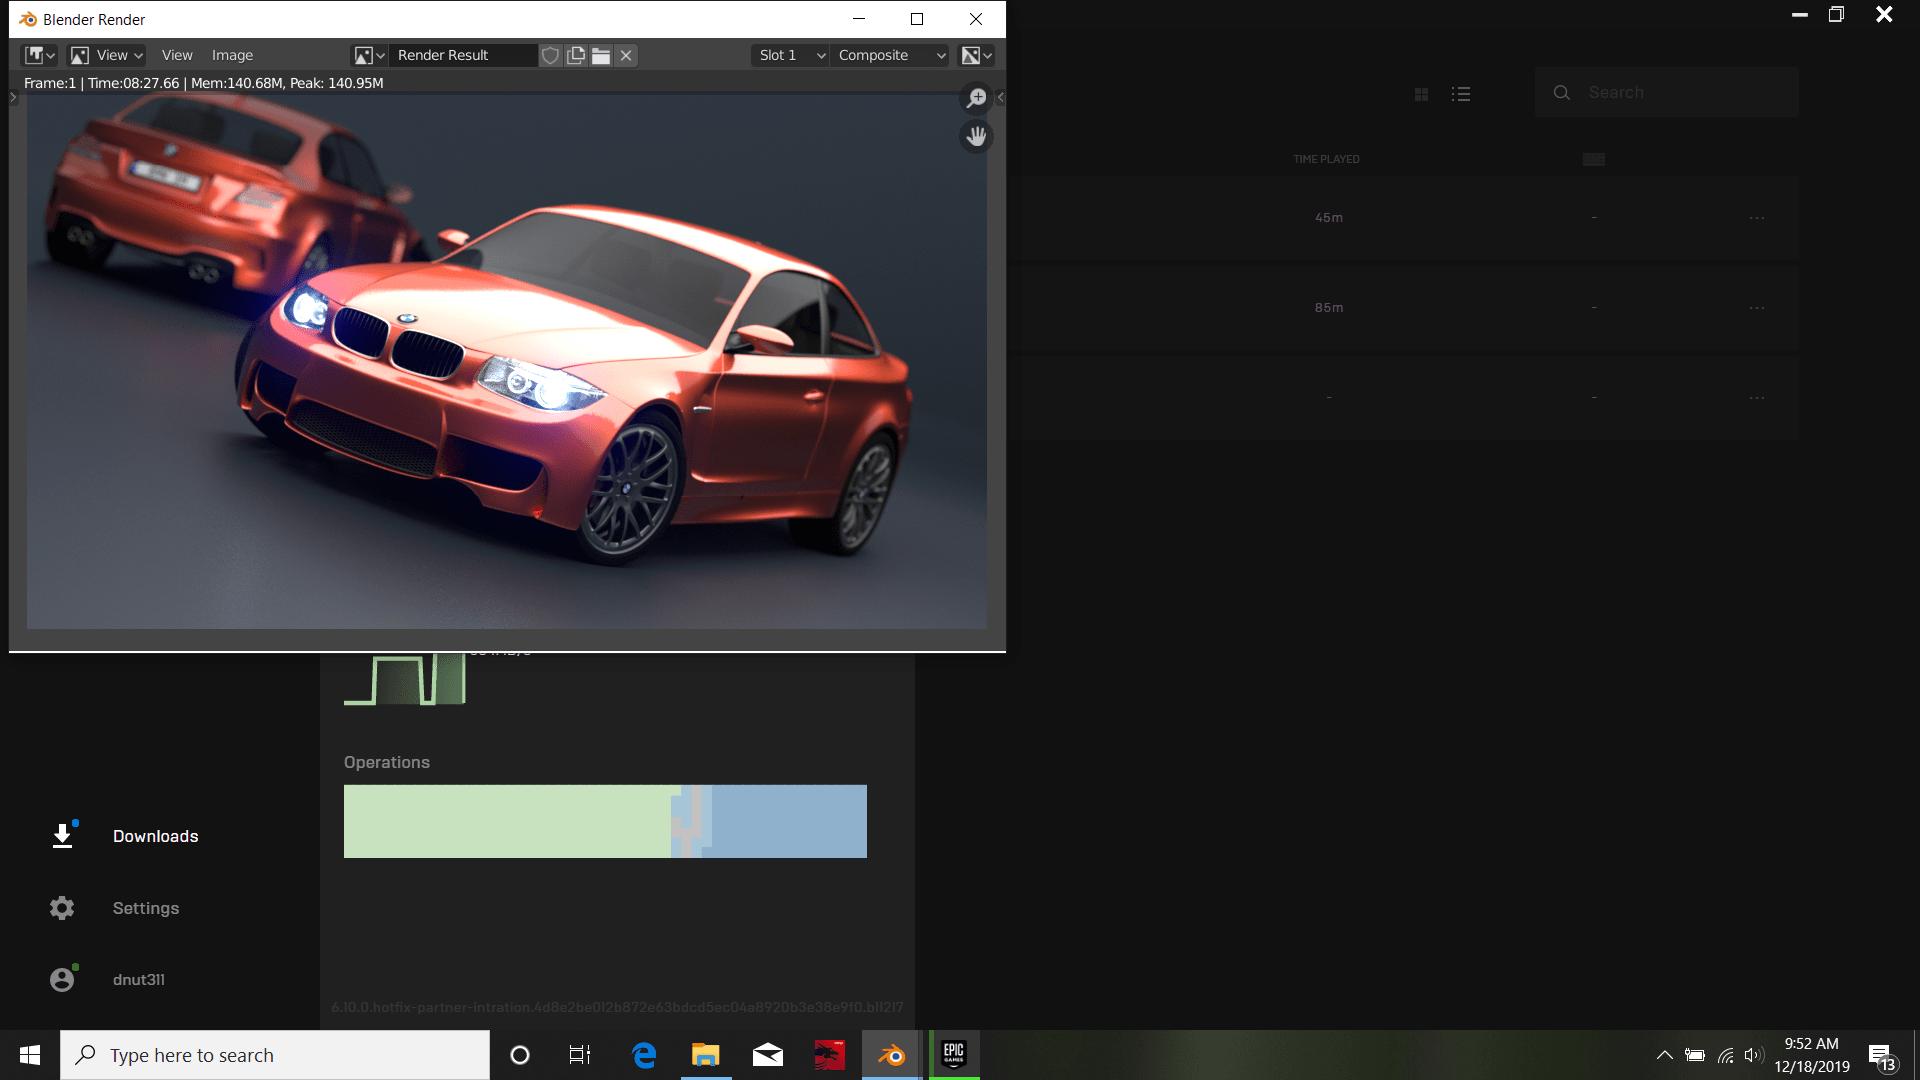 Blender BMW Scene MSI Alpha 15